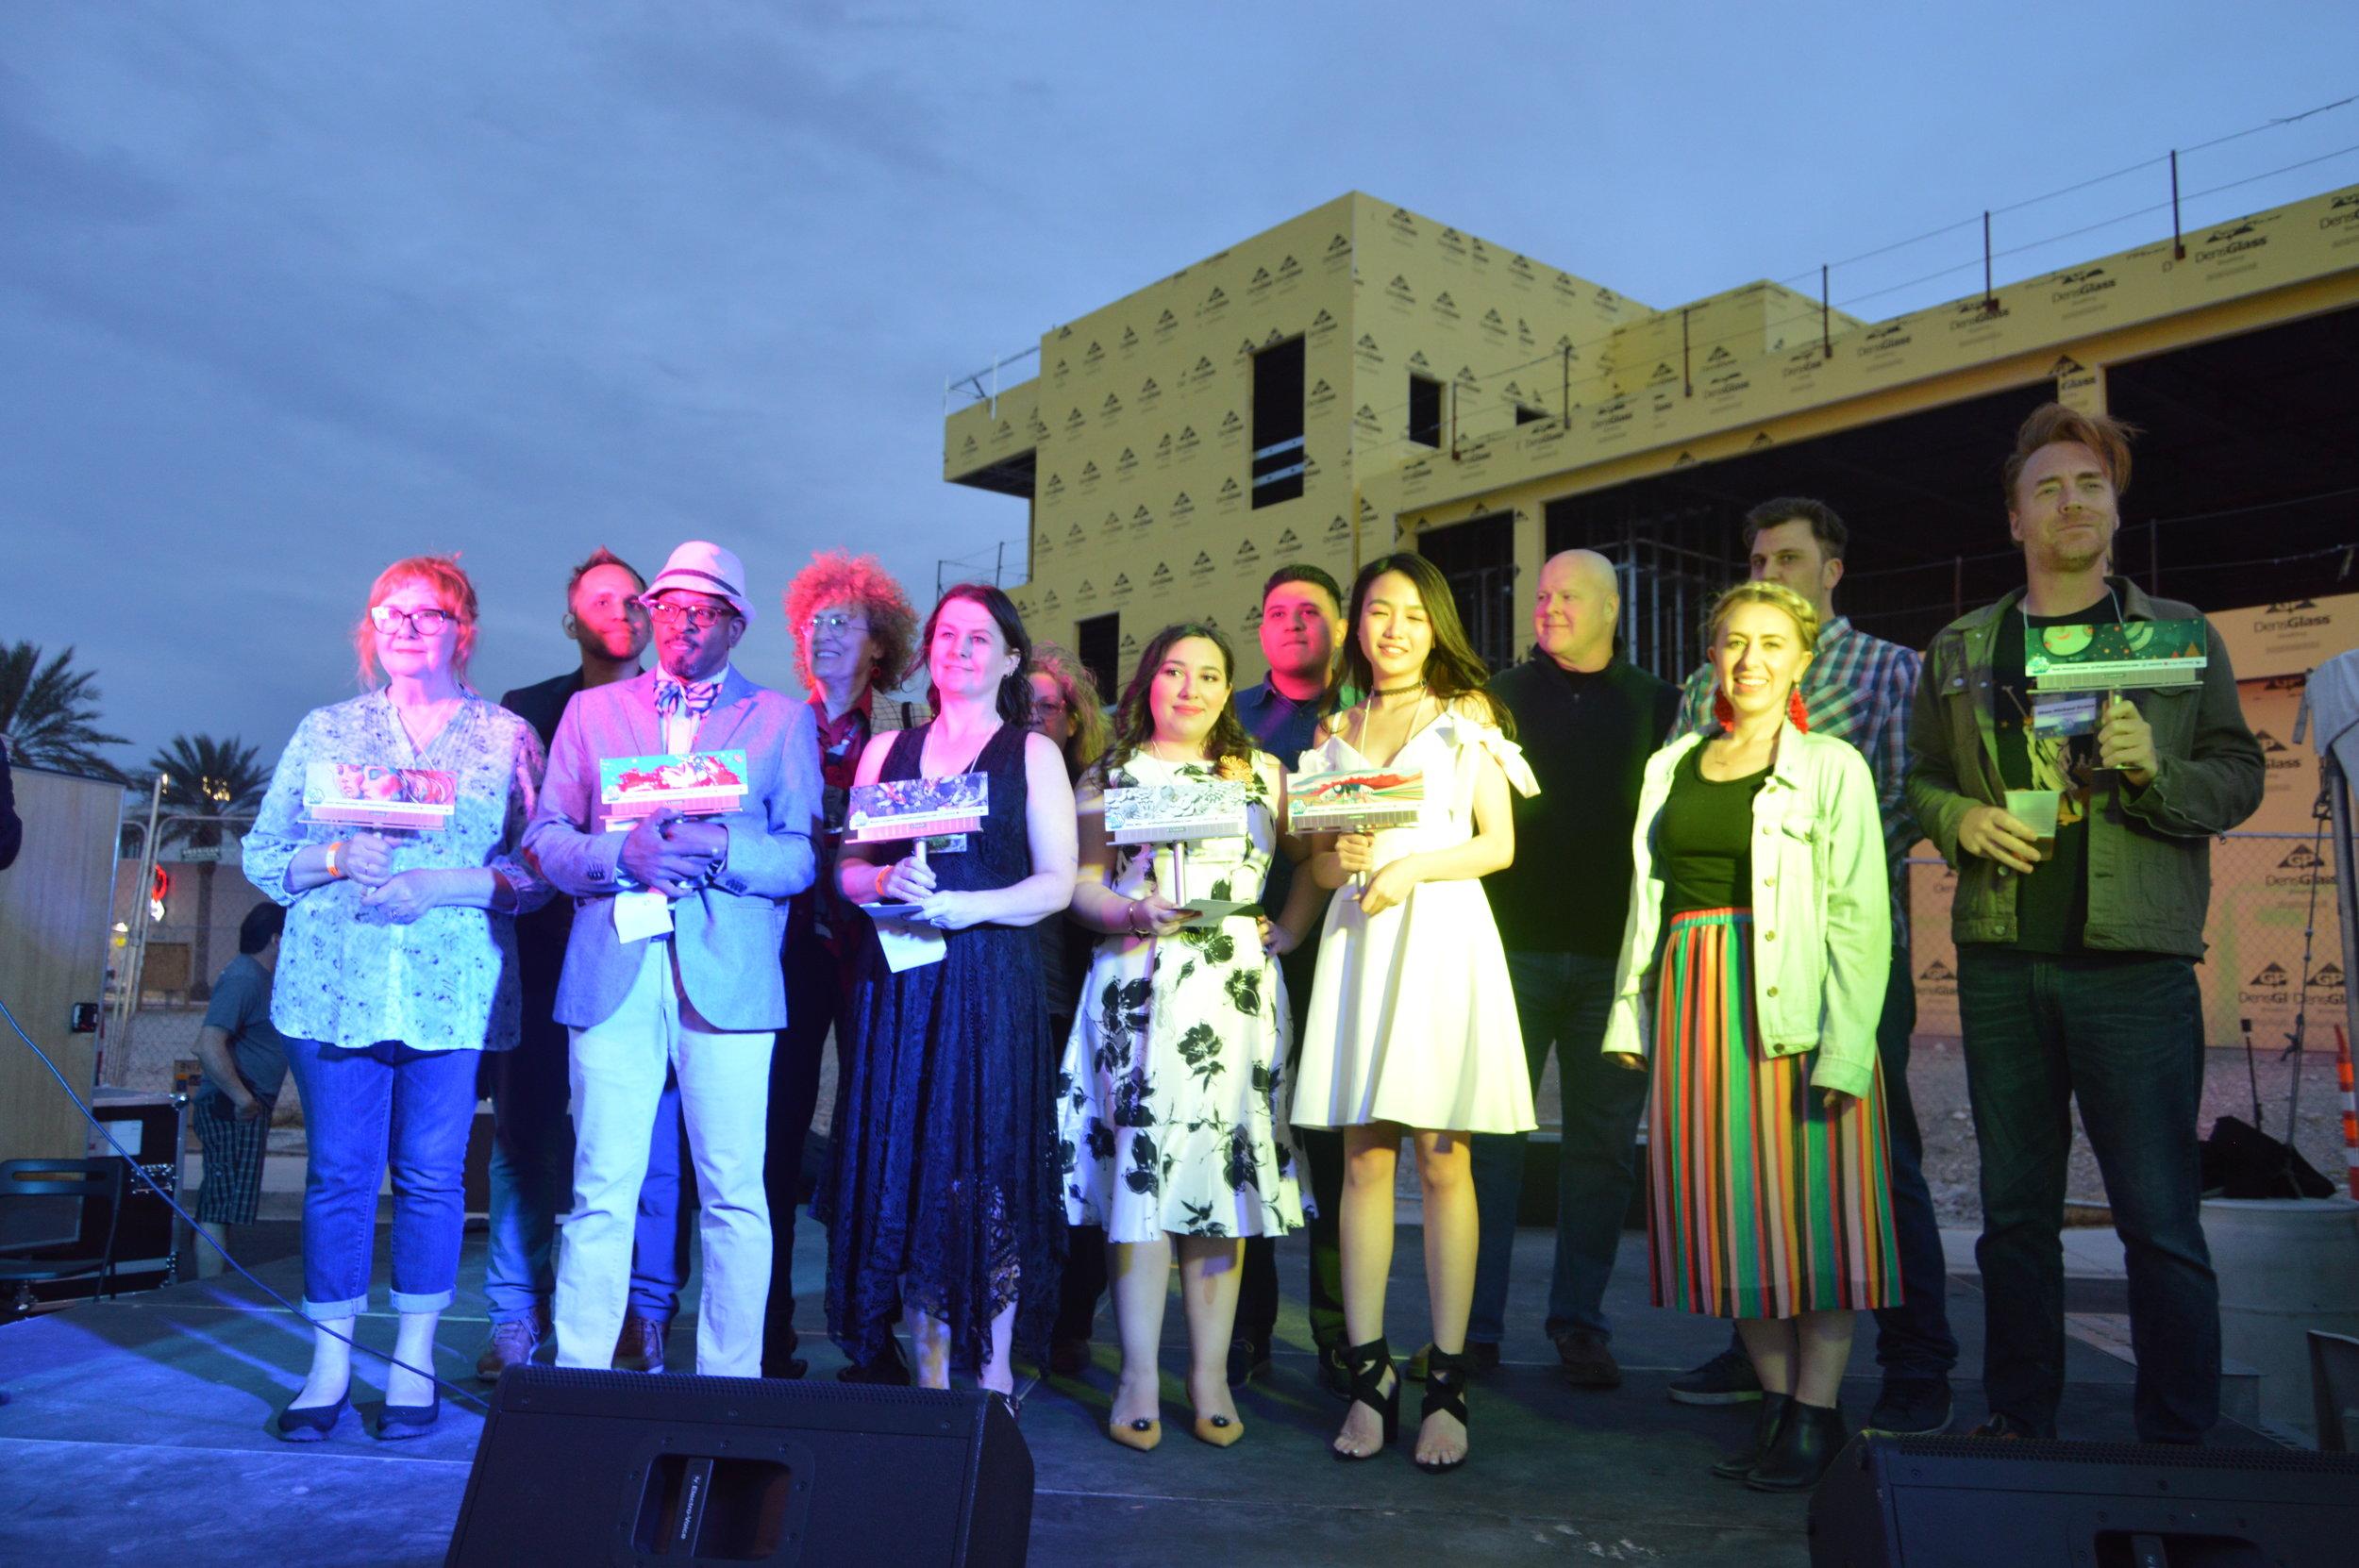 ArtPop Las Vegas 2019 Winners joined by the jury panel and past ArtPop alumni. Photo by Theresa Bautista